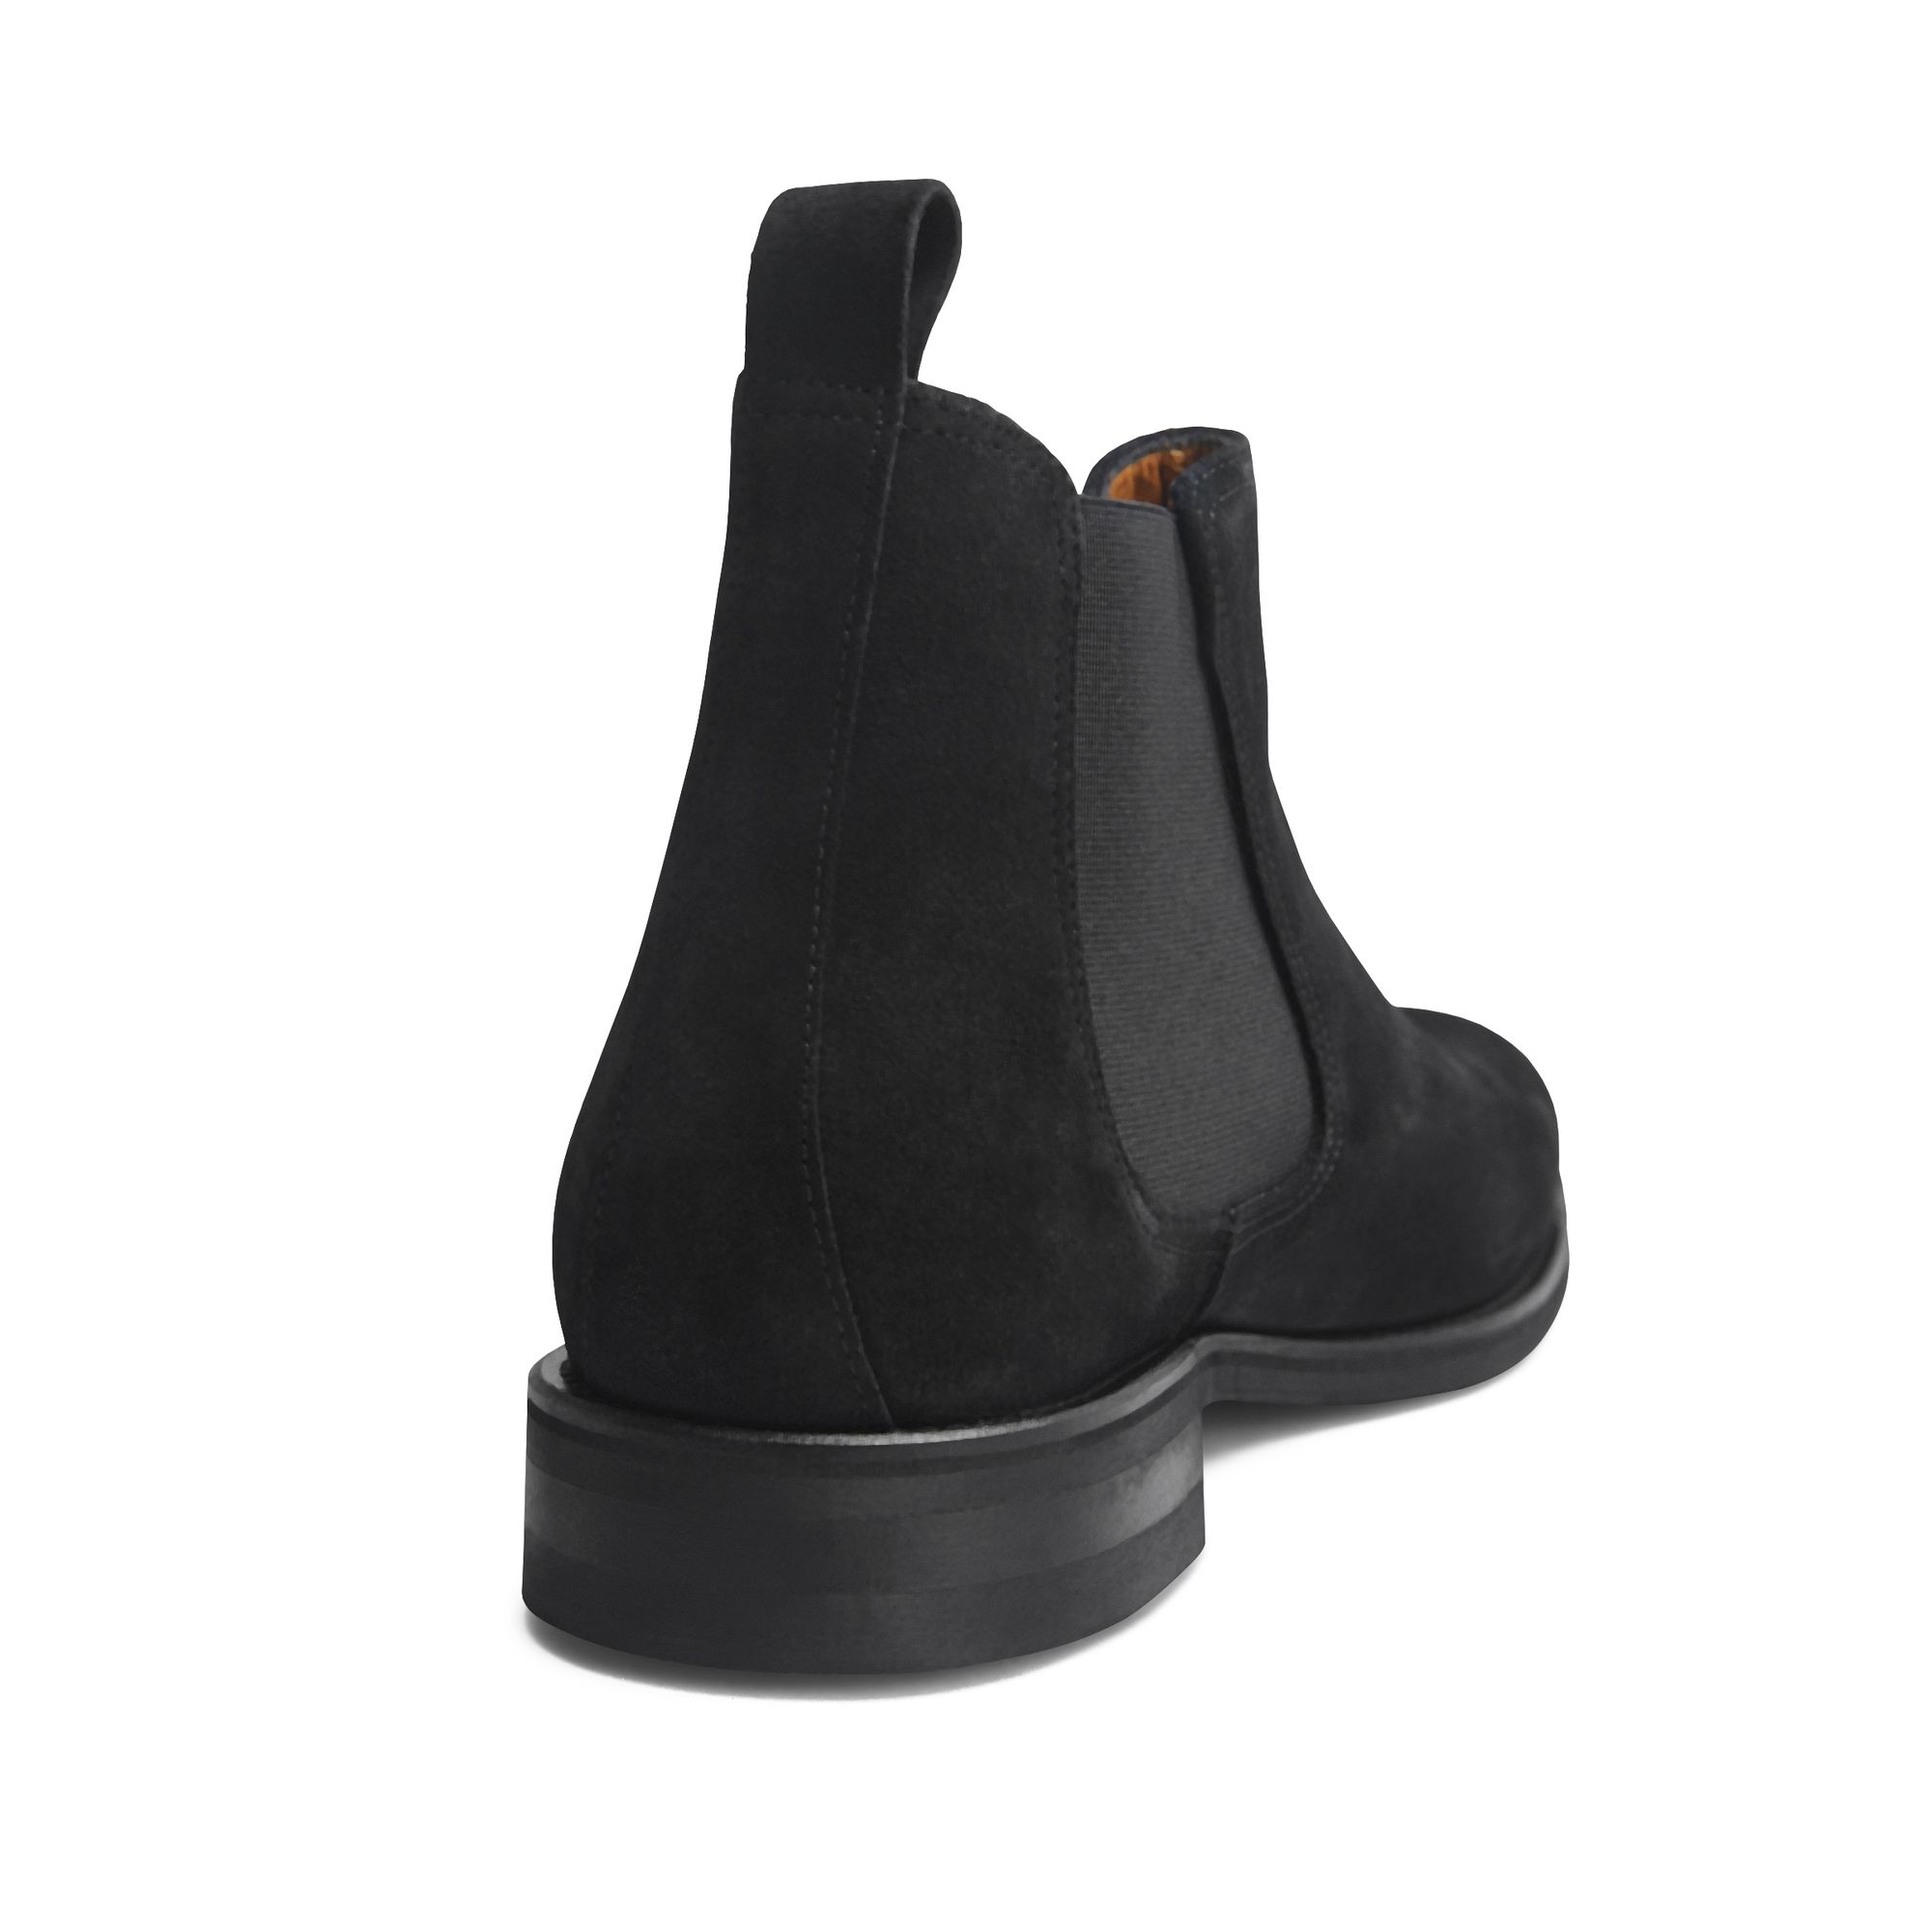 66af92e00a4 Rizzo Rizzo Abaco chelsea boots i mocka | Rizzo